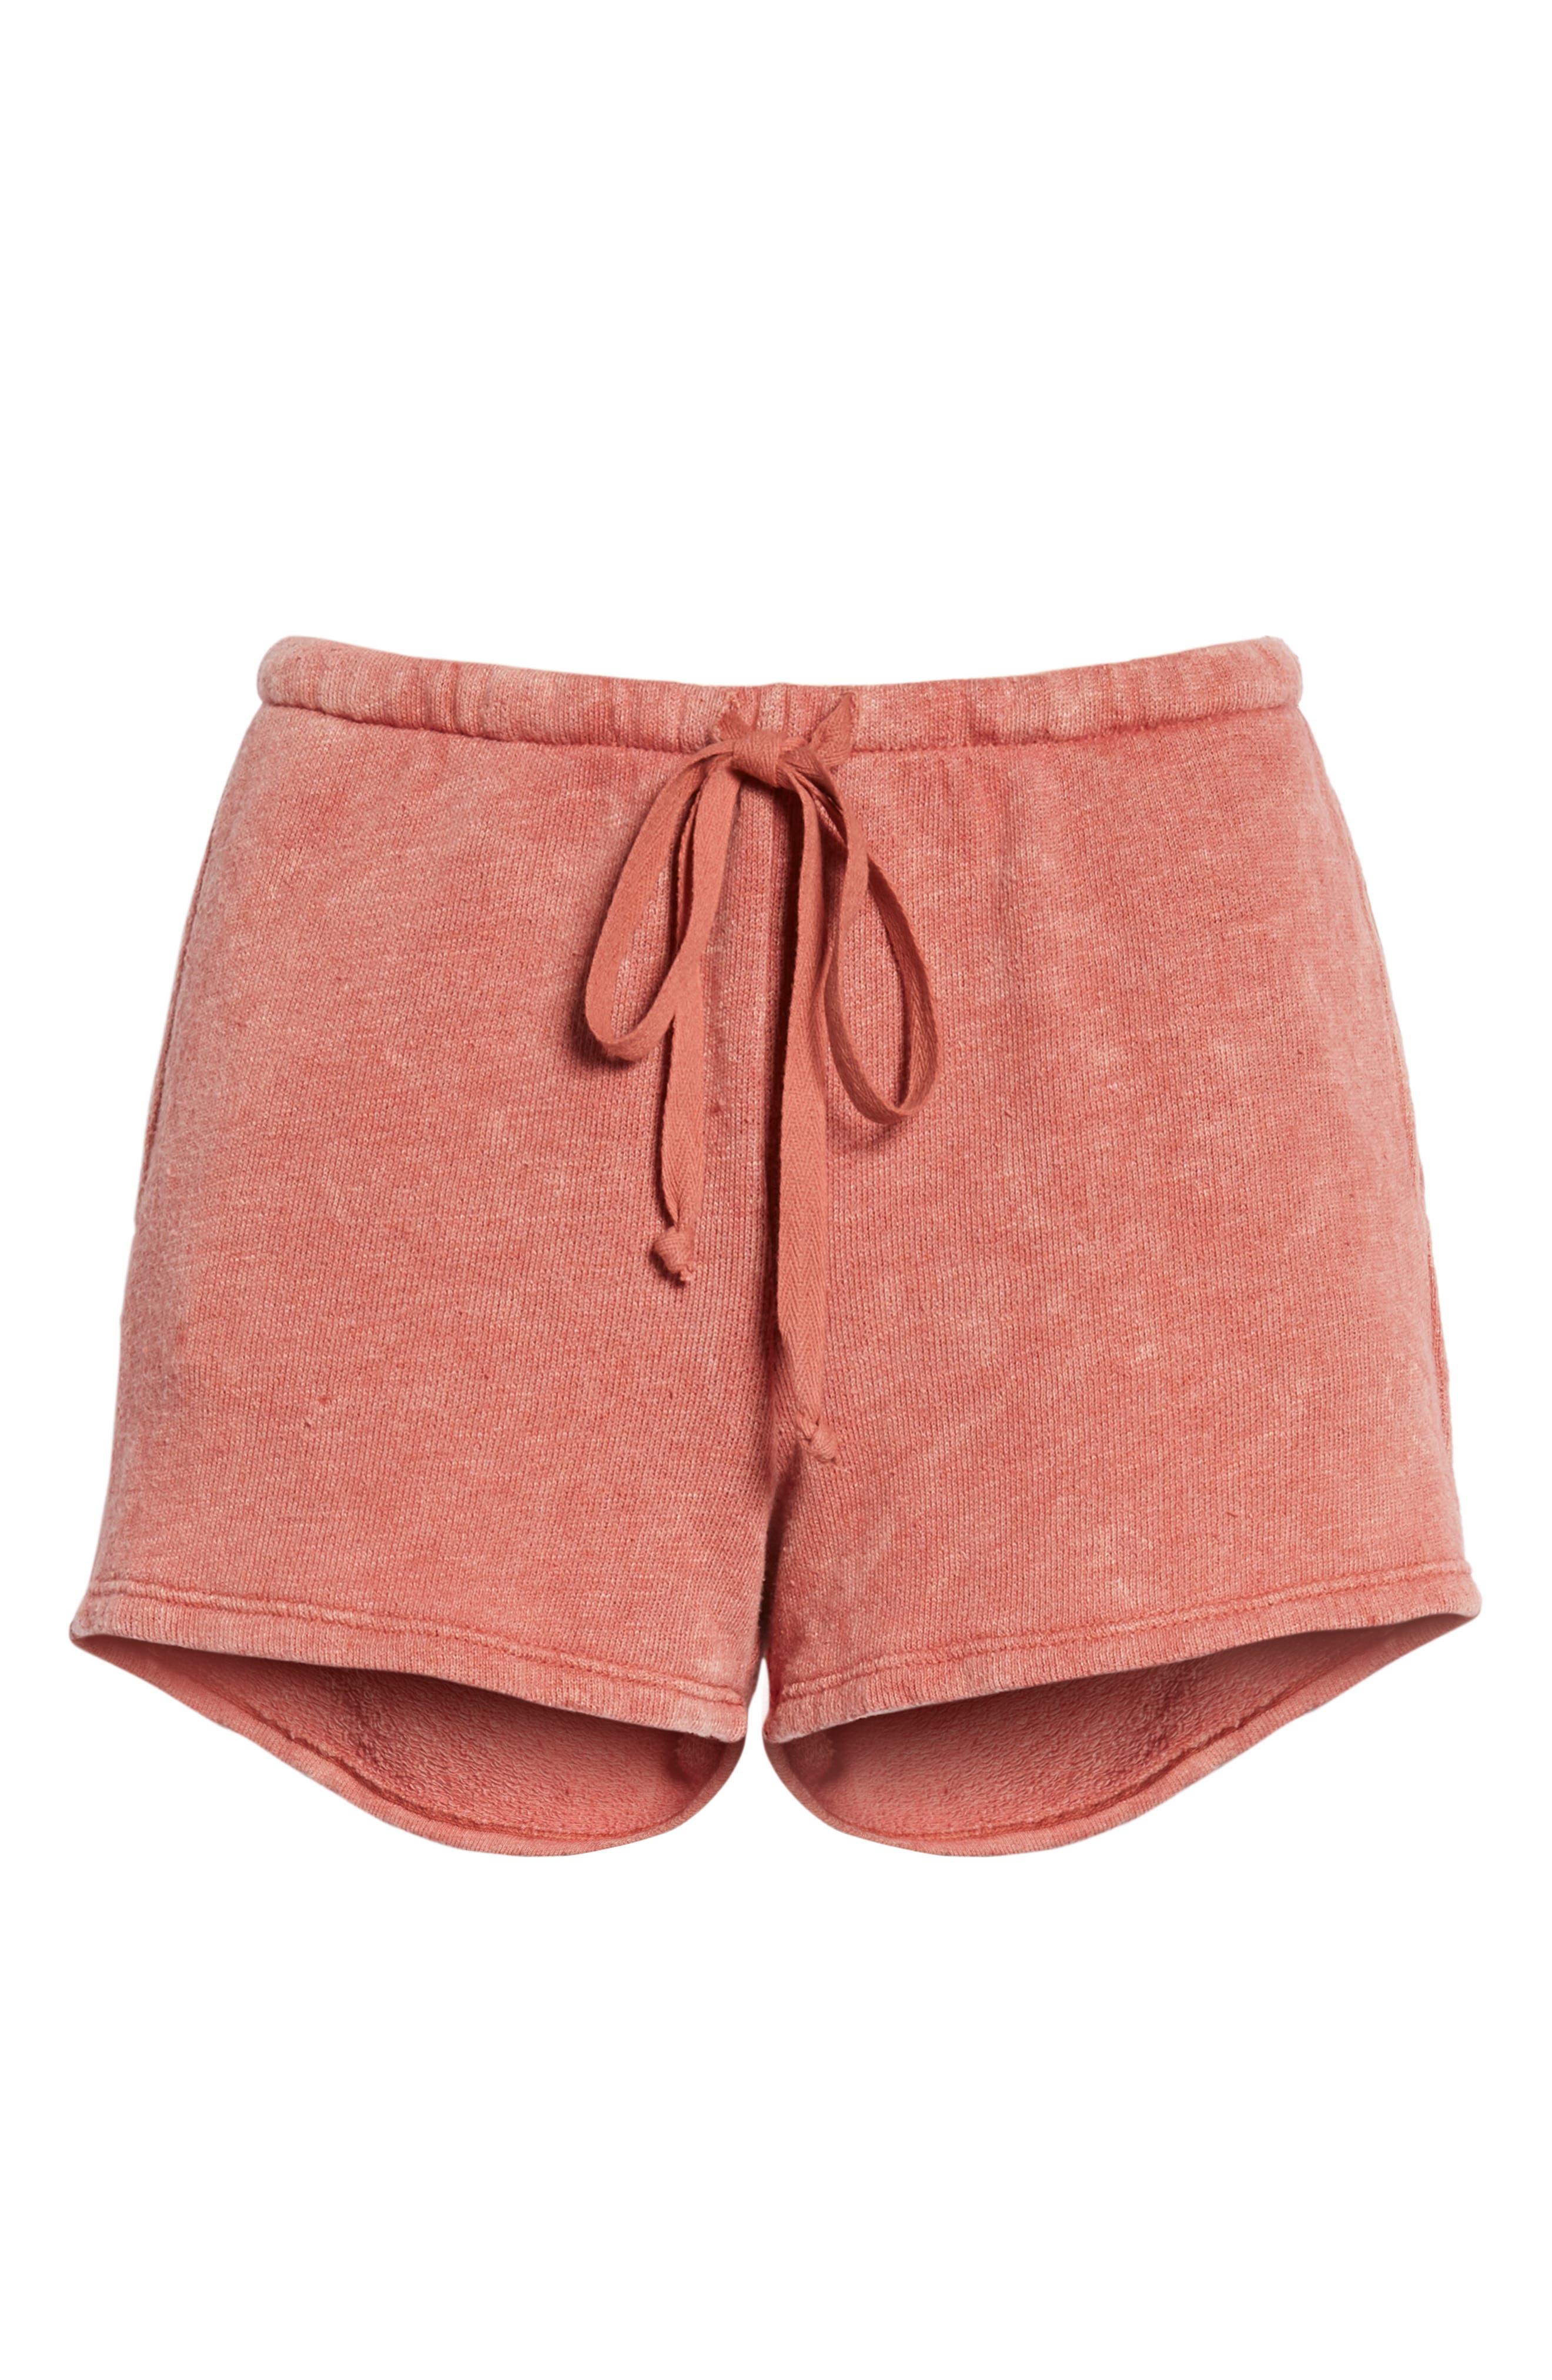 Kiama Shorts,                             Alternate thumbnail 6, color,                             Strawberry Rouge